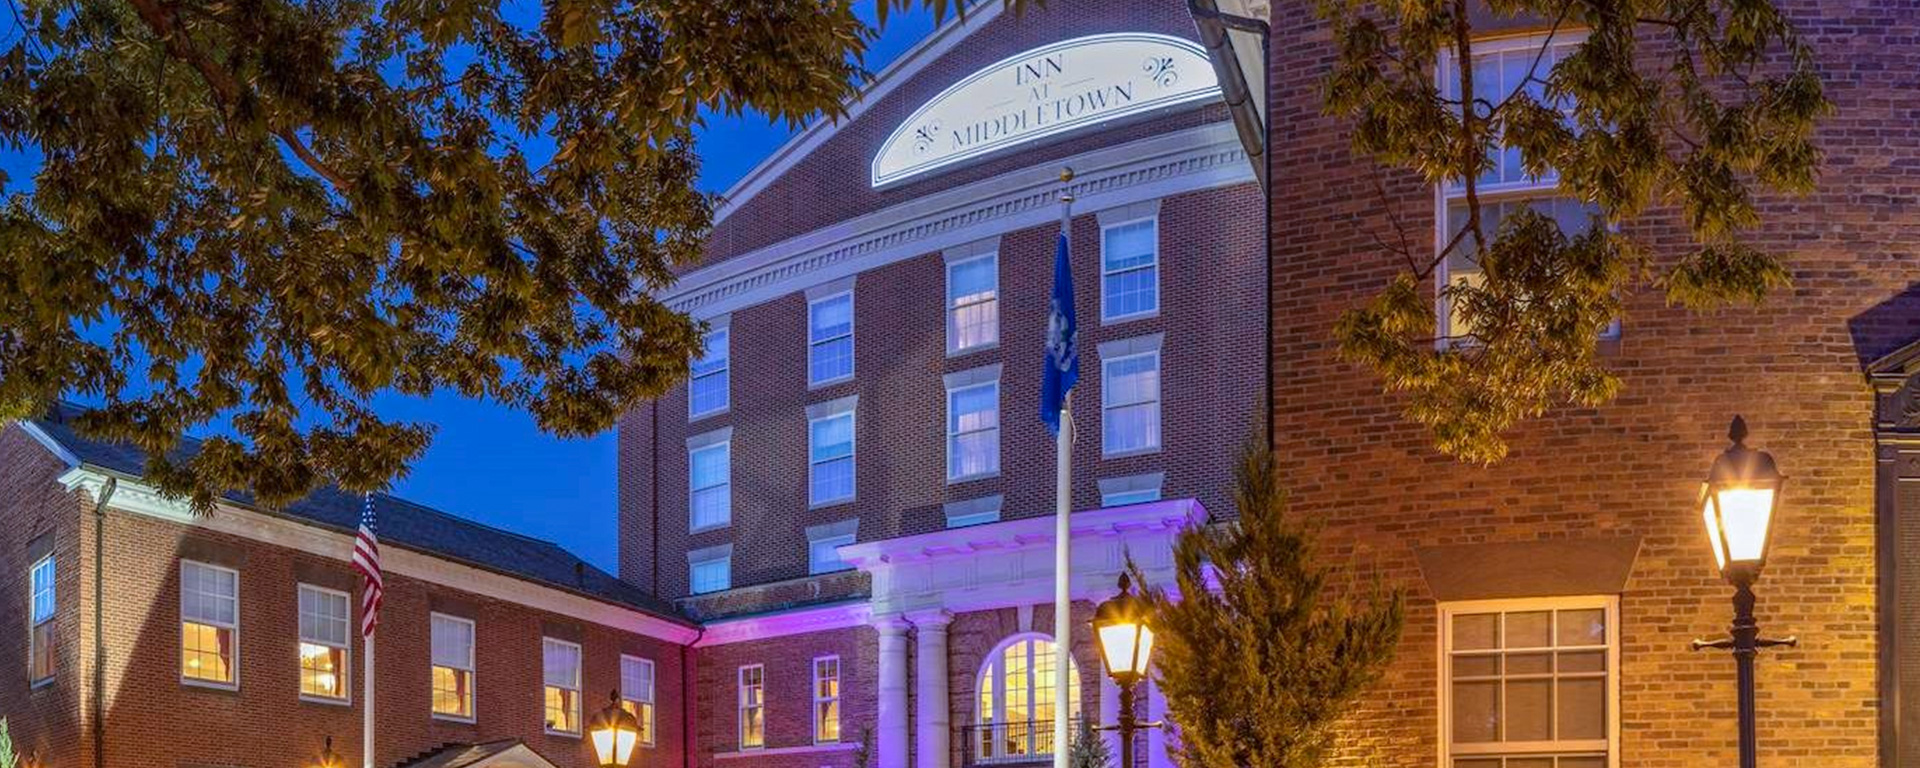 Linchris Hotel Corporation Newsletters